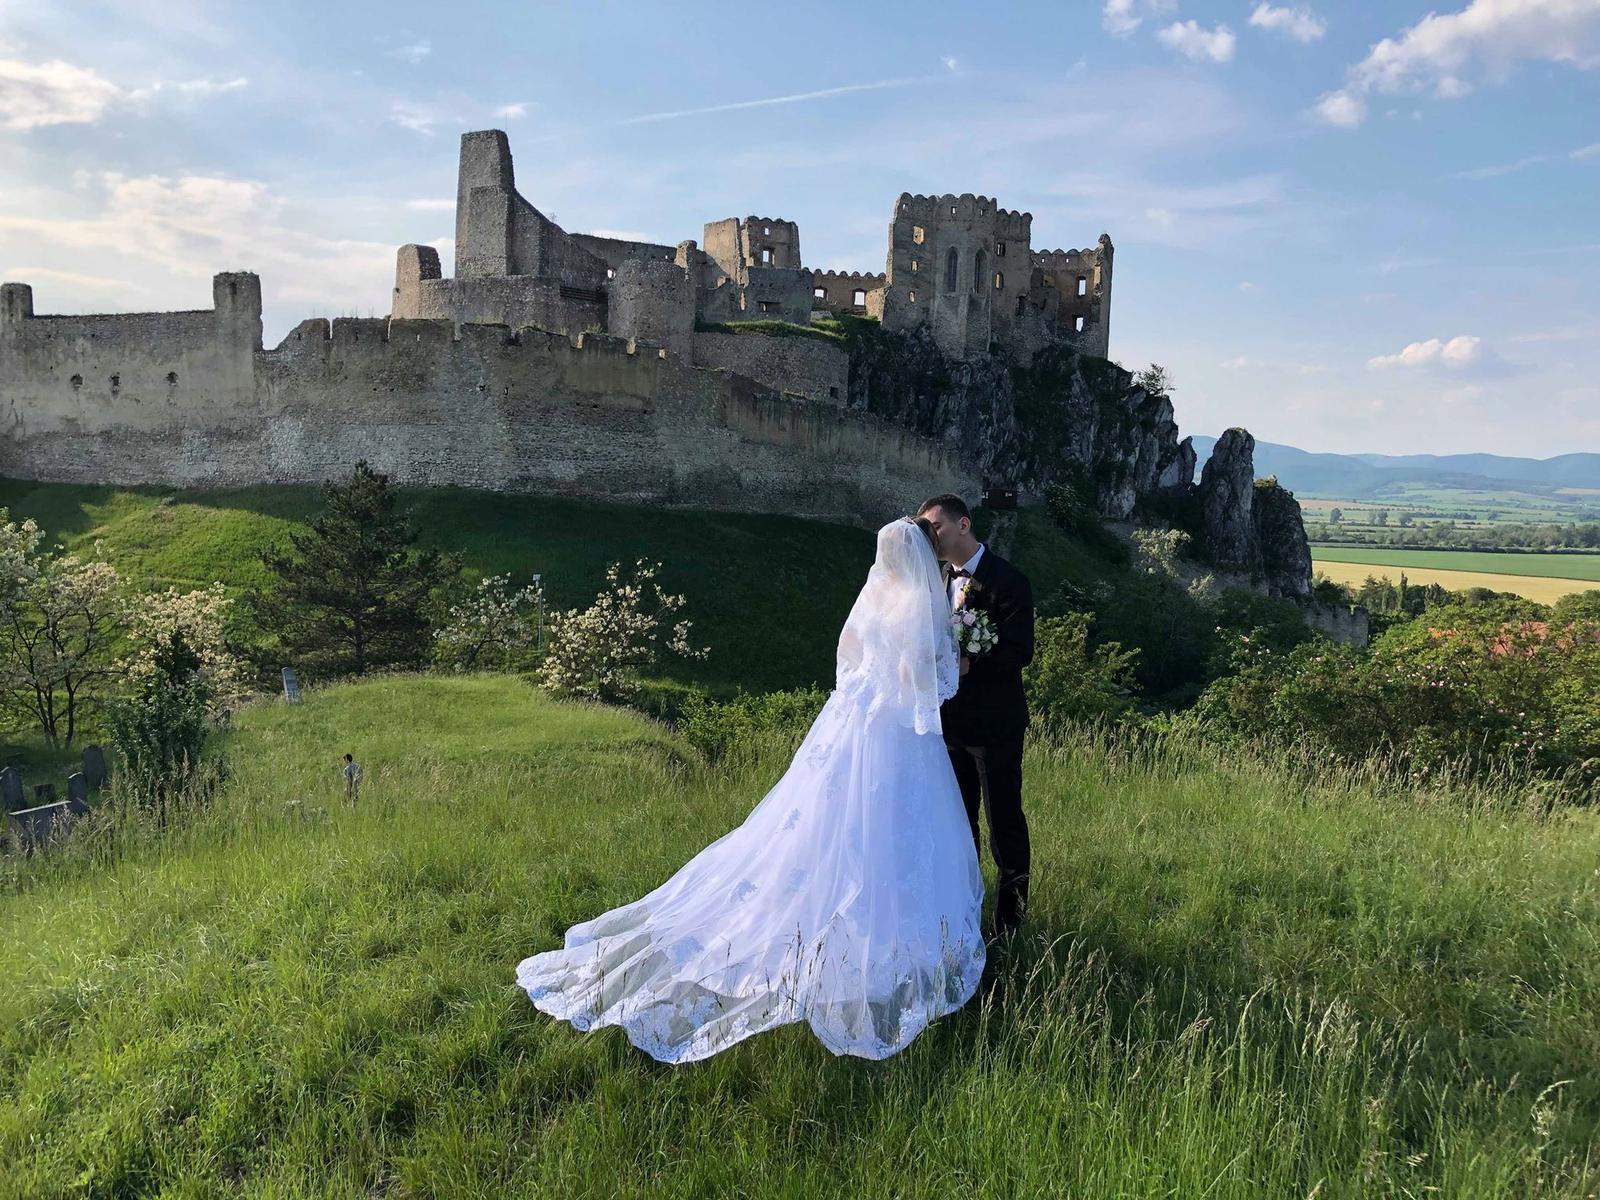 Svadobné šaty s vlečkou - Obrázok č. 2